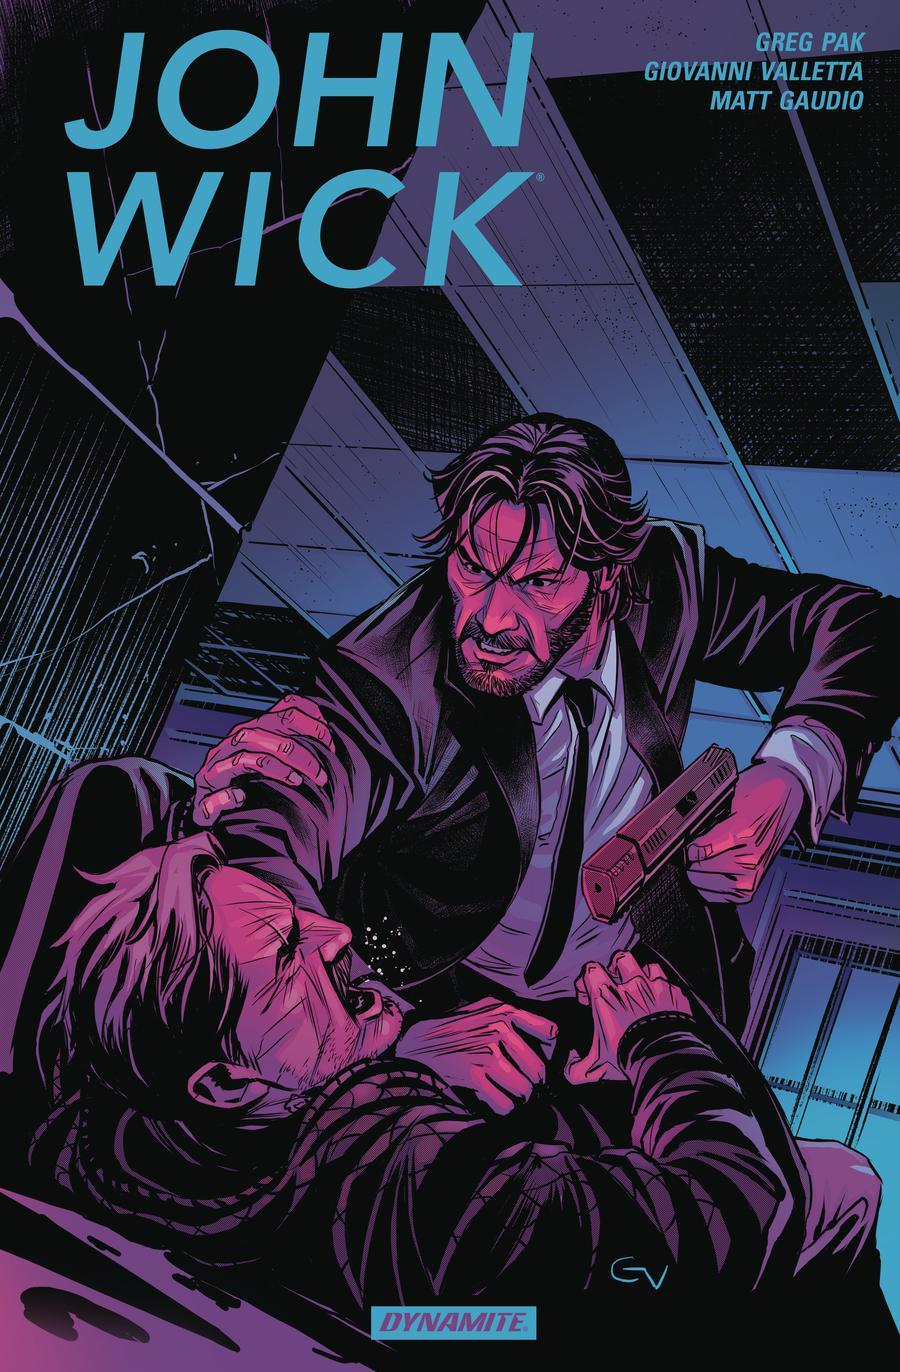 John Wick Vol 1 HC Regular Edition